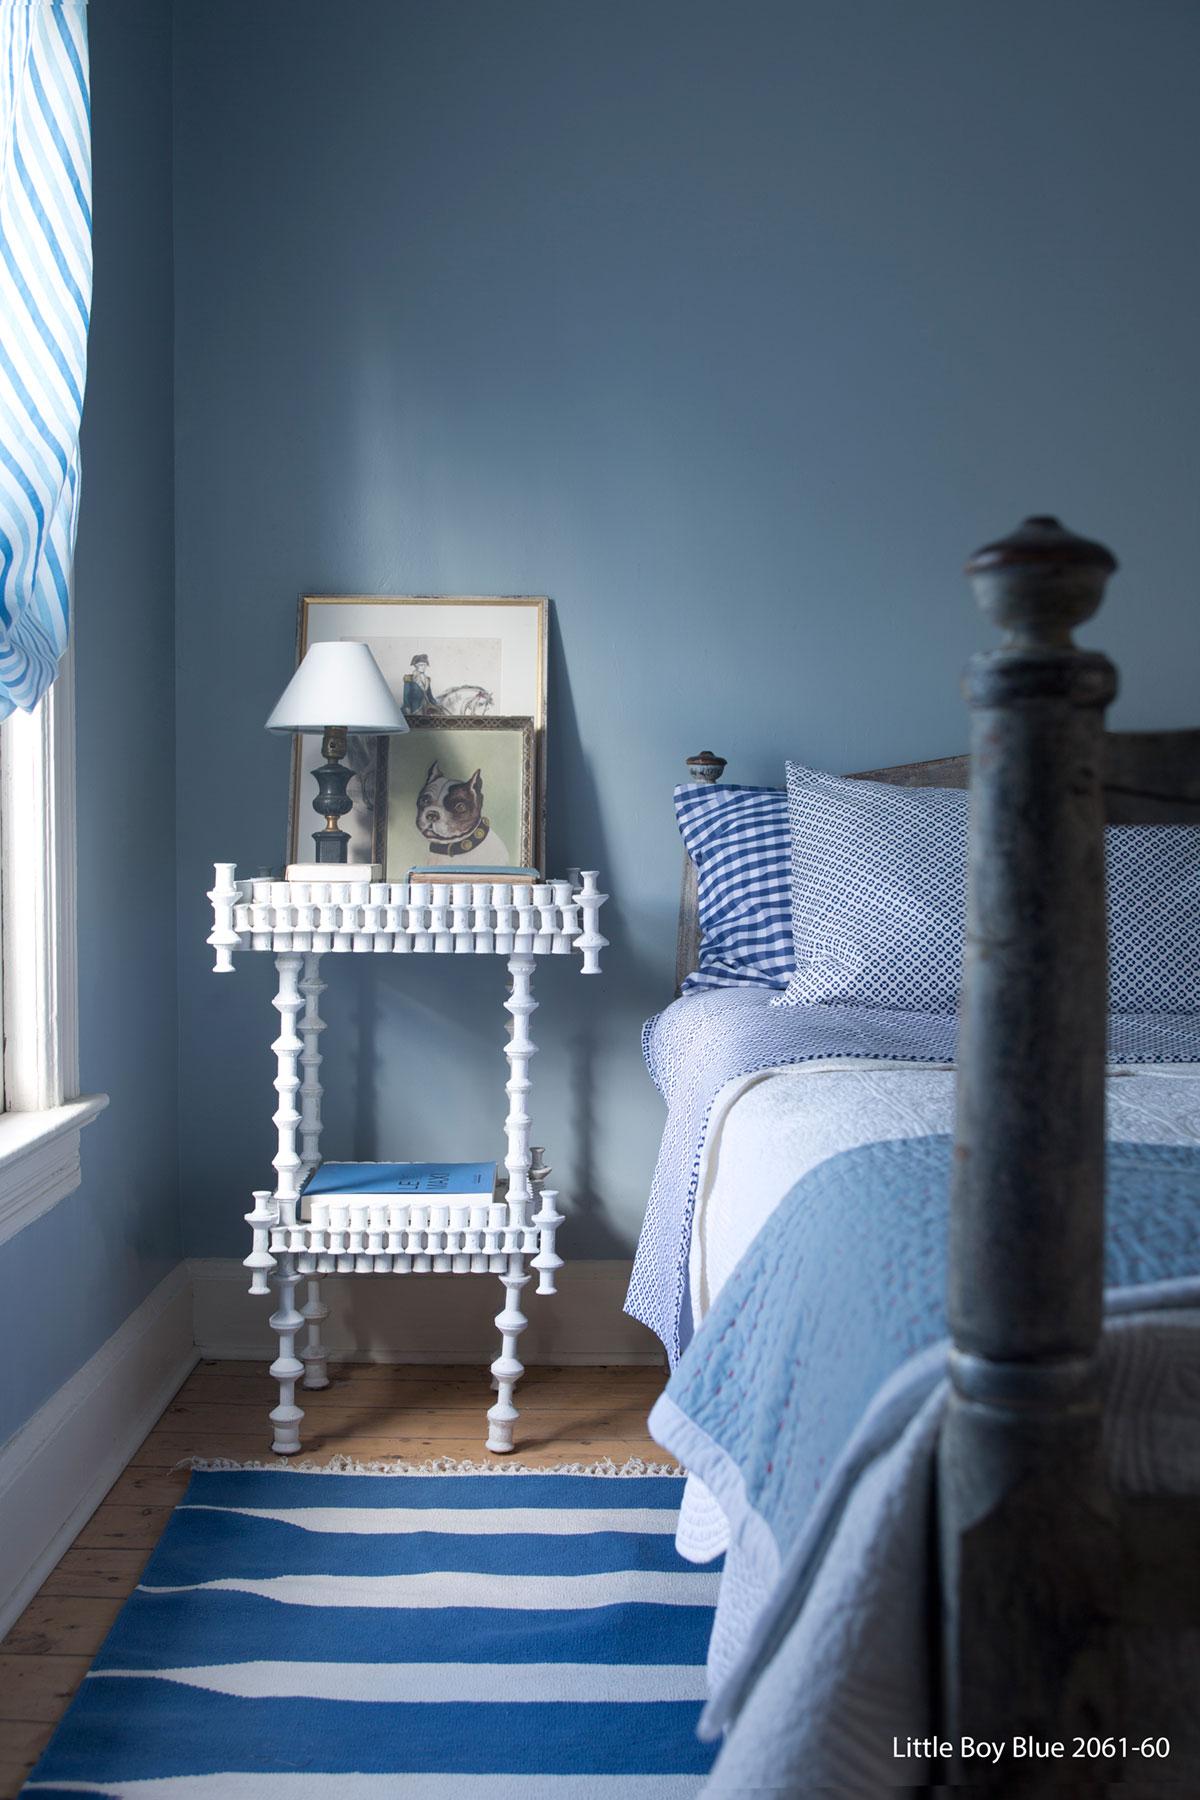 bedroom_littleboyblue_2061_60-3.jpg